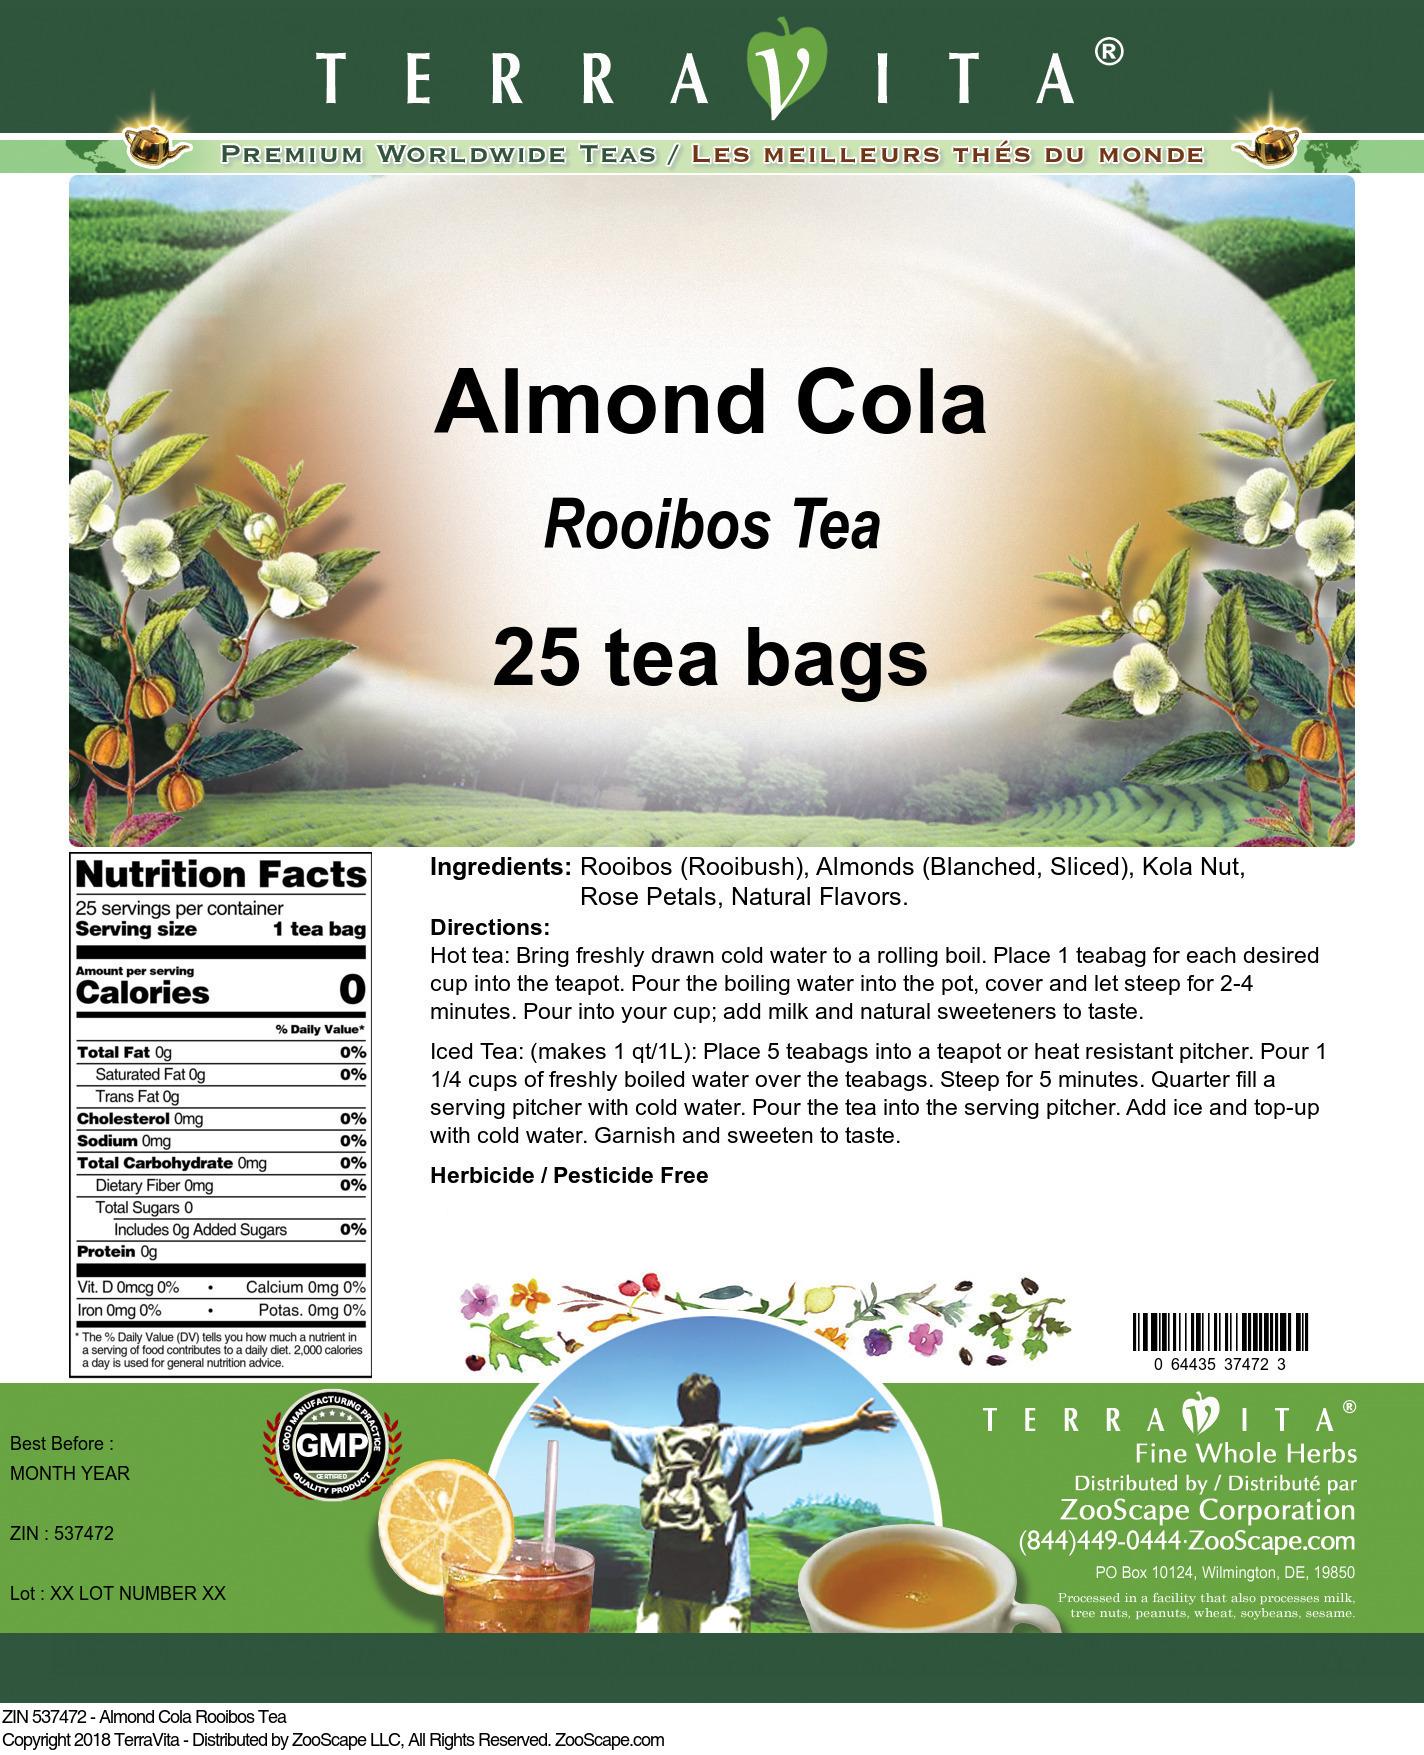 Almond Cola Rooibos Tea